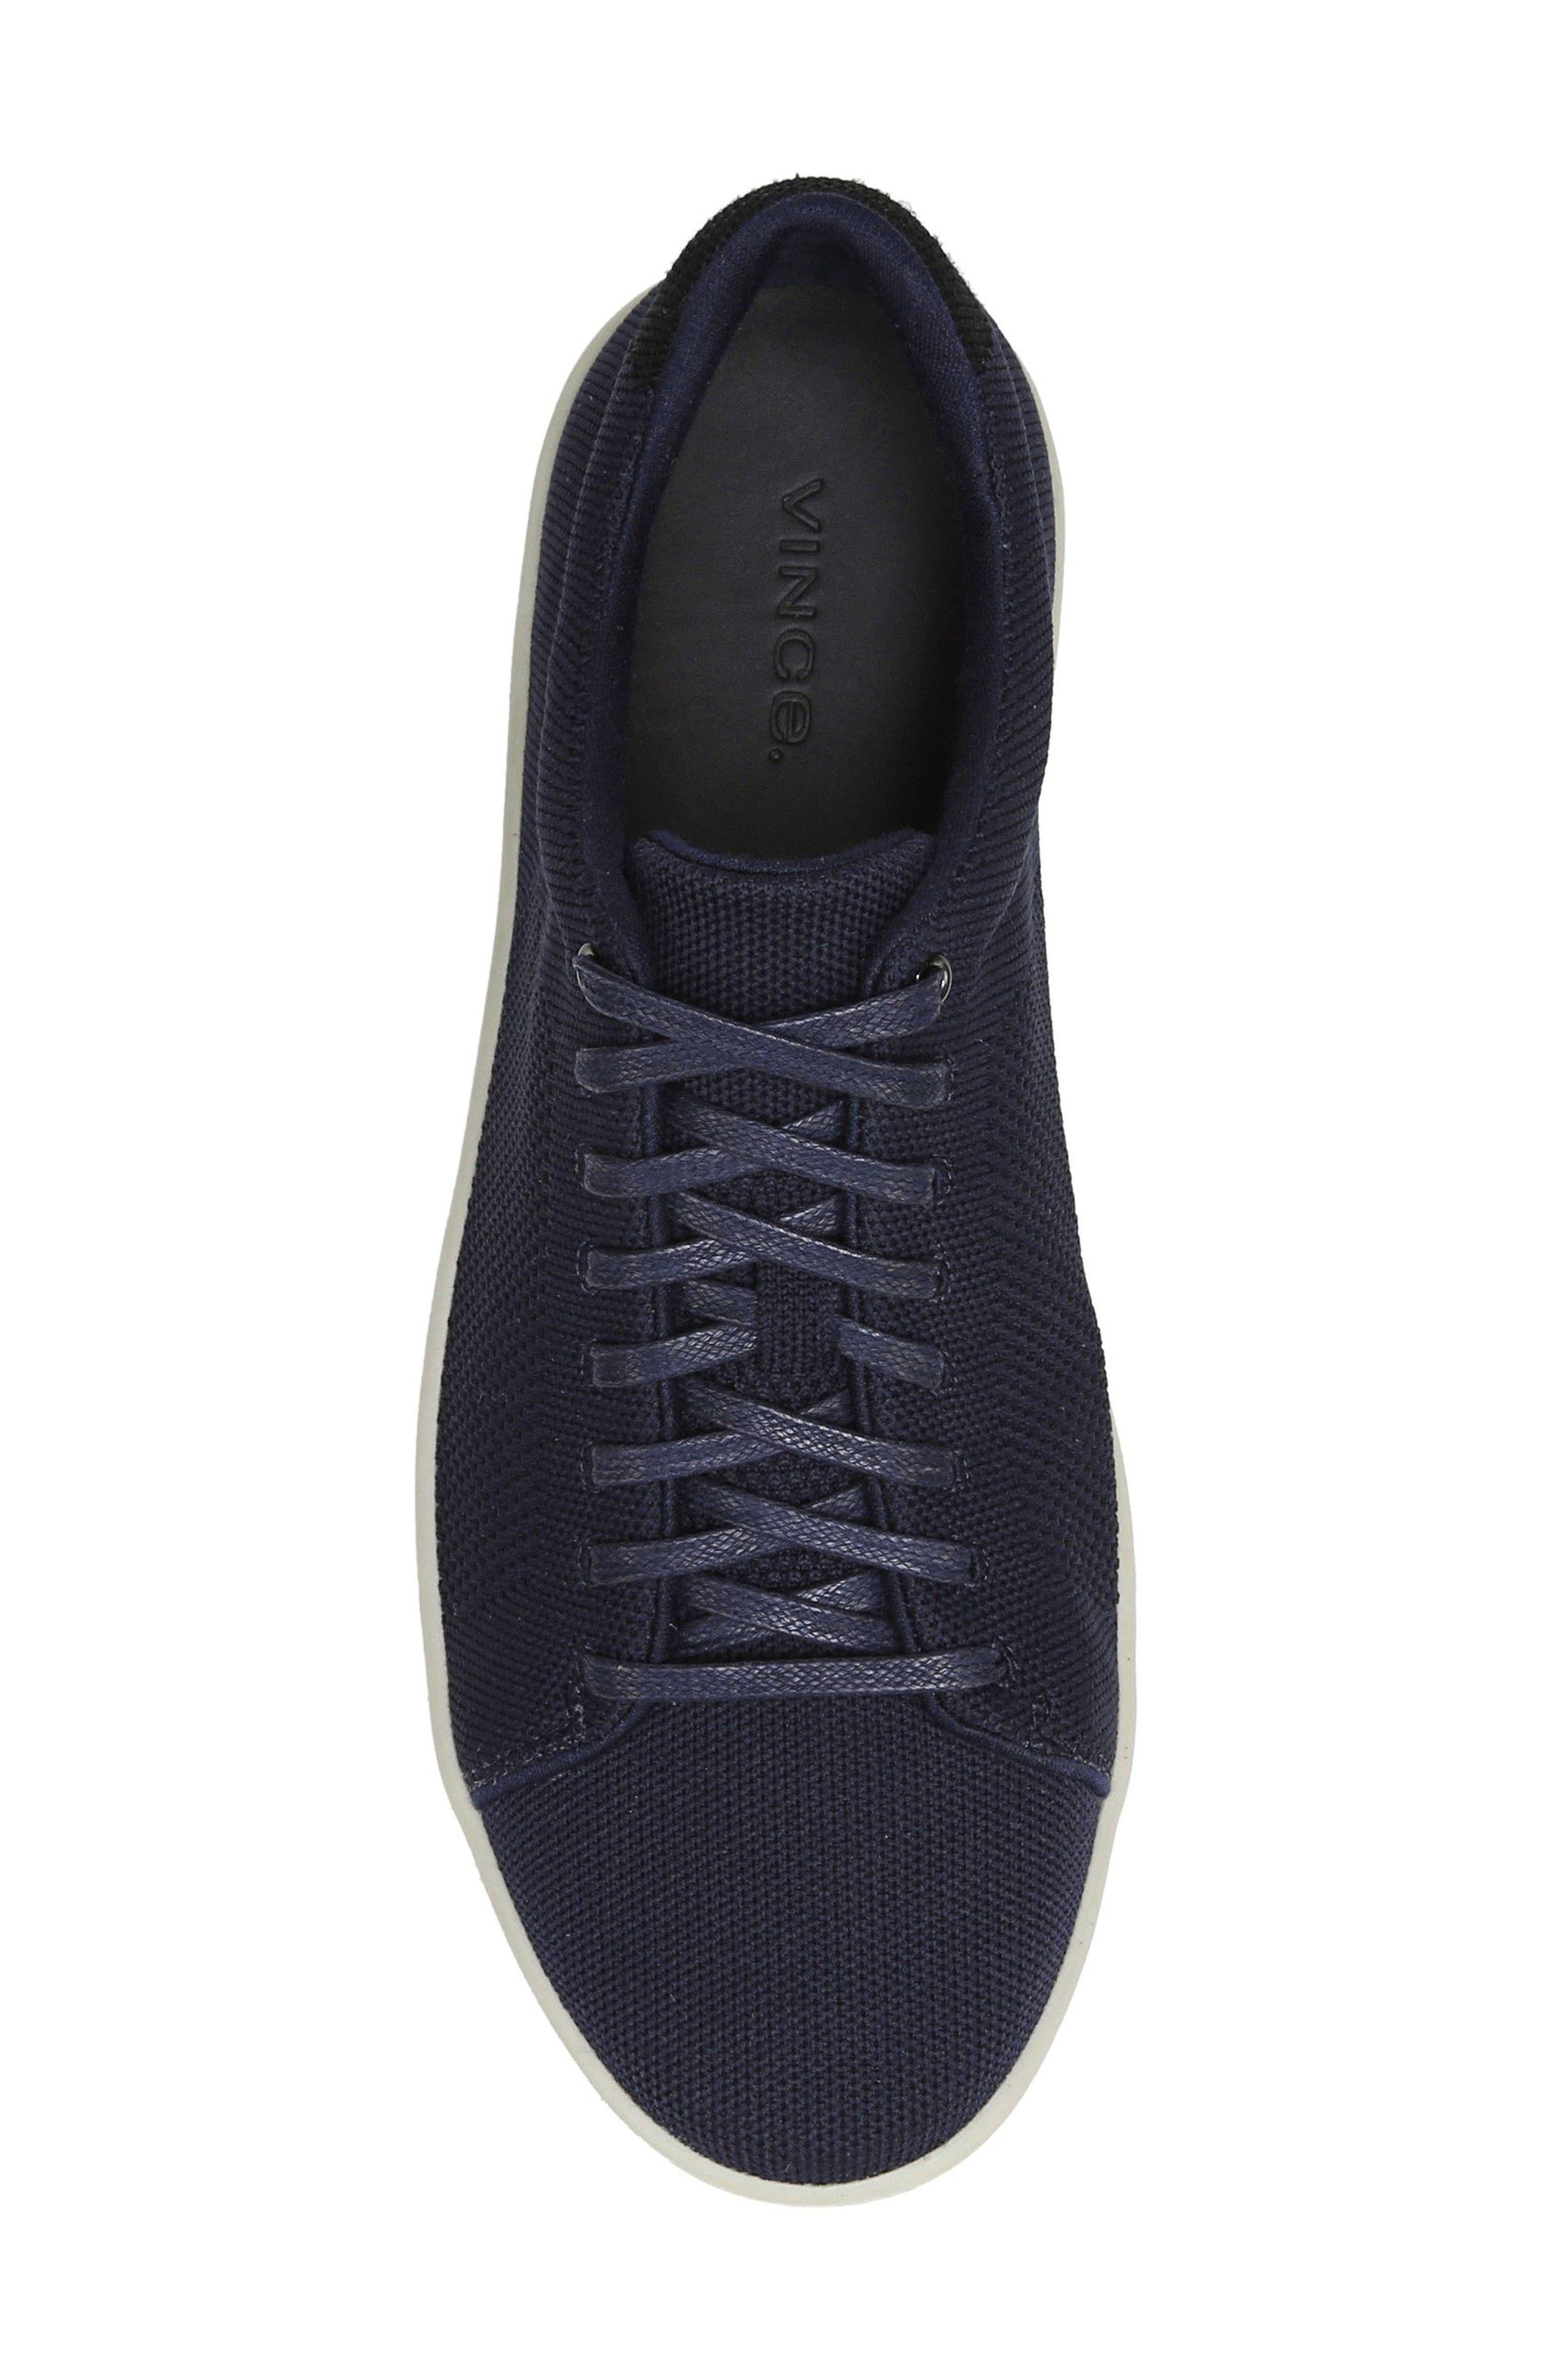 Silos Knit Low Top Sneaker,                             Alternate thumbnail 5, color,                             Coastal